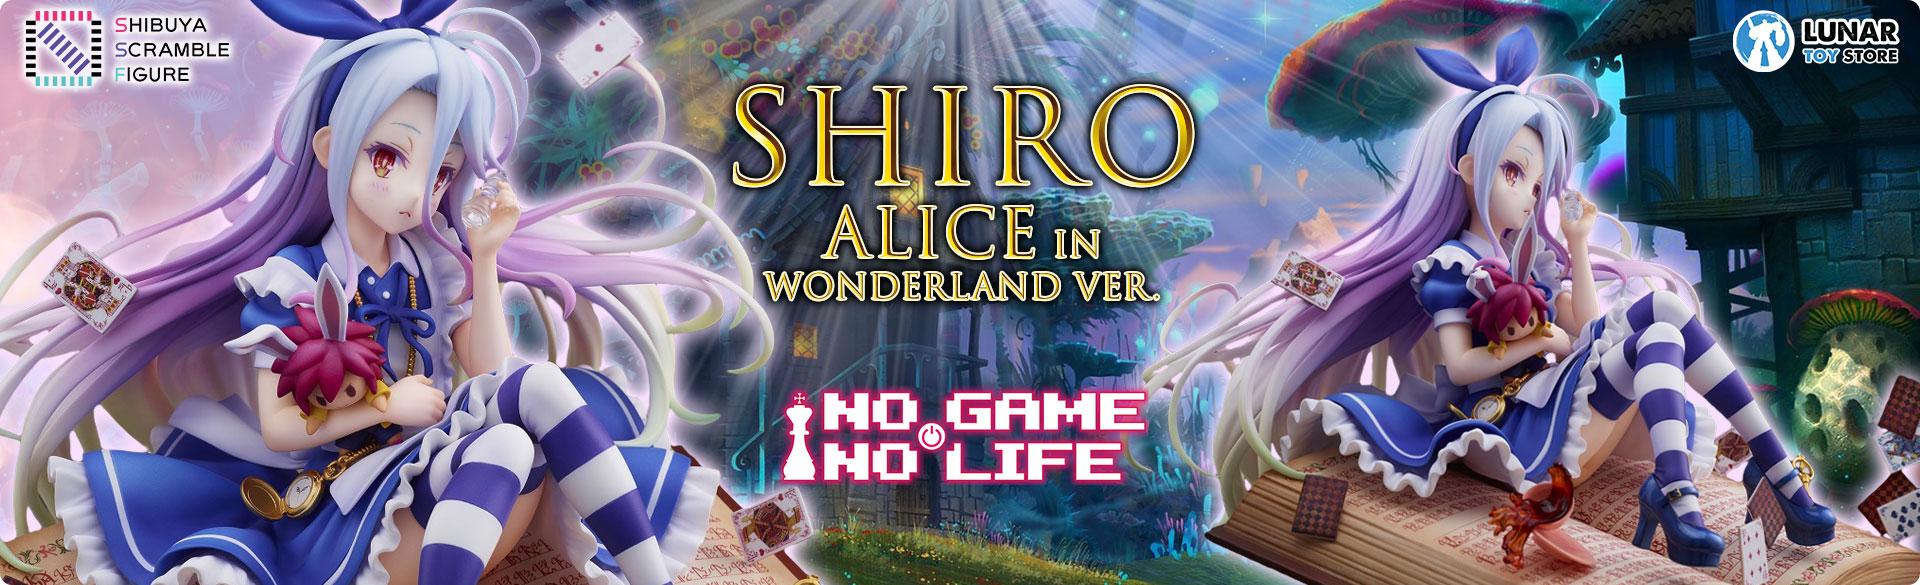 Shiro Alice in Wonderland Ver